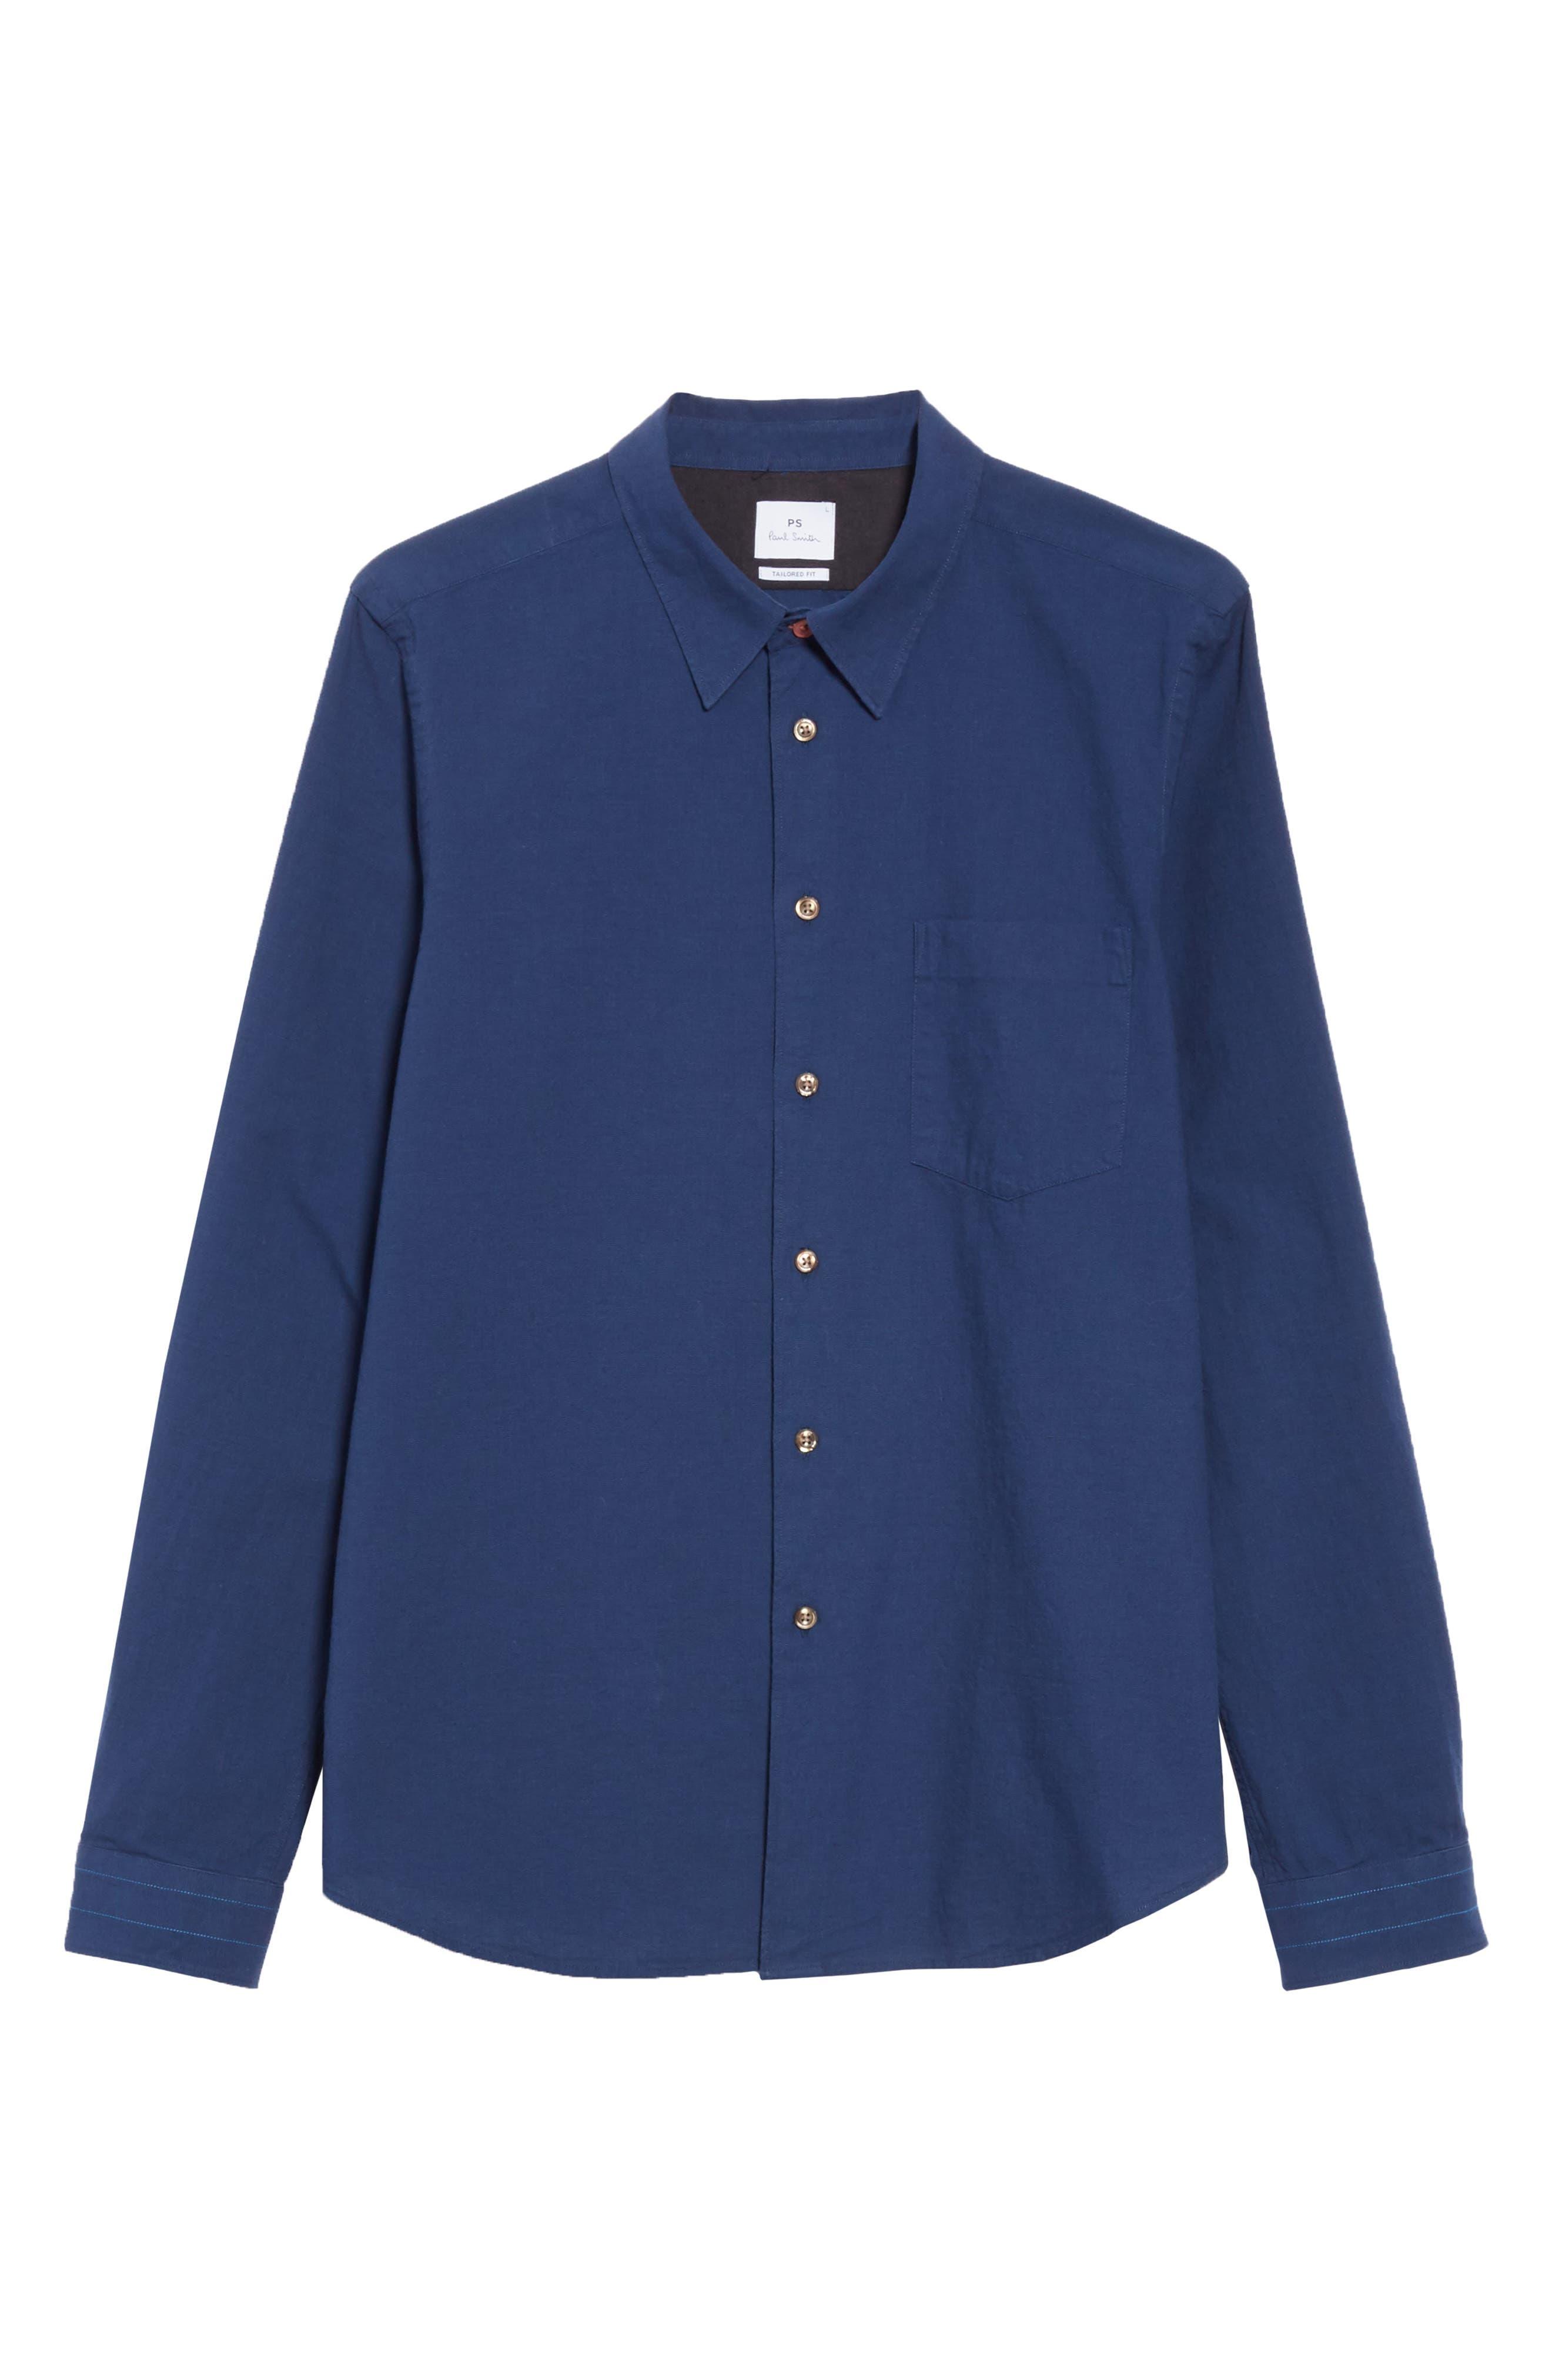 PS PAUL SMITH, Contrast Sport Shirt, Alternate thumbnail 5, color, BLUE